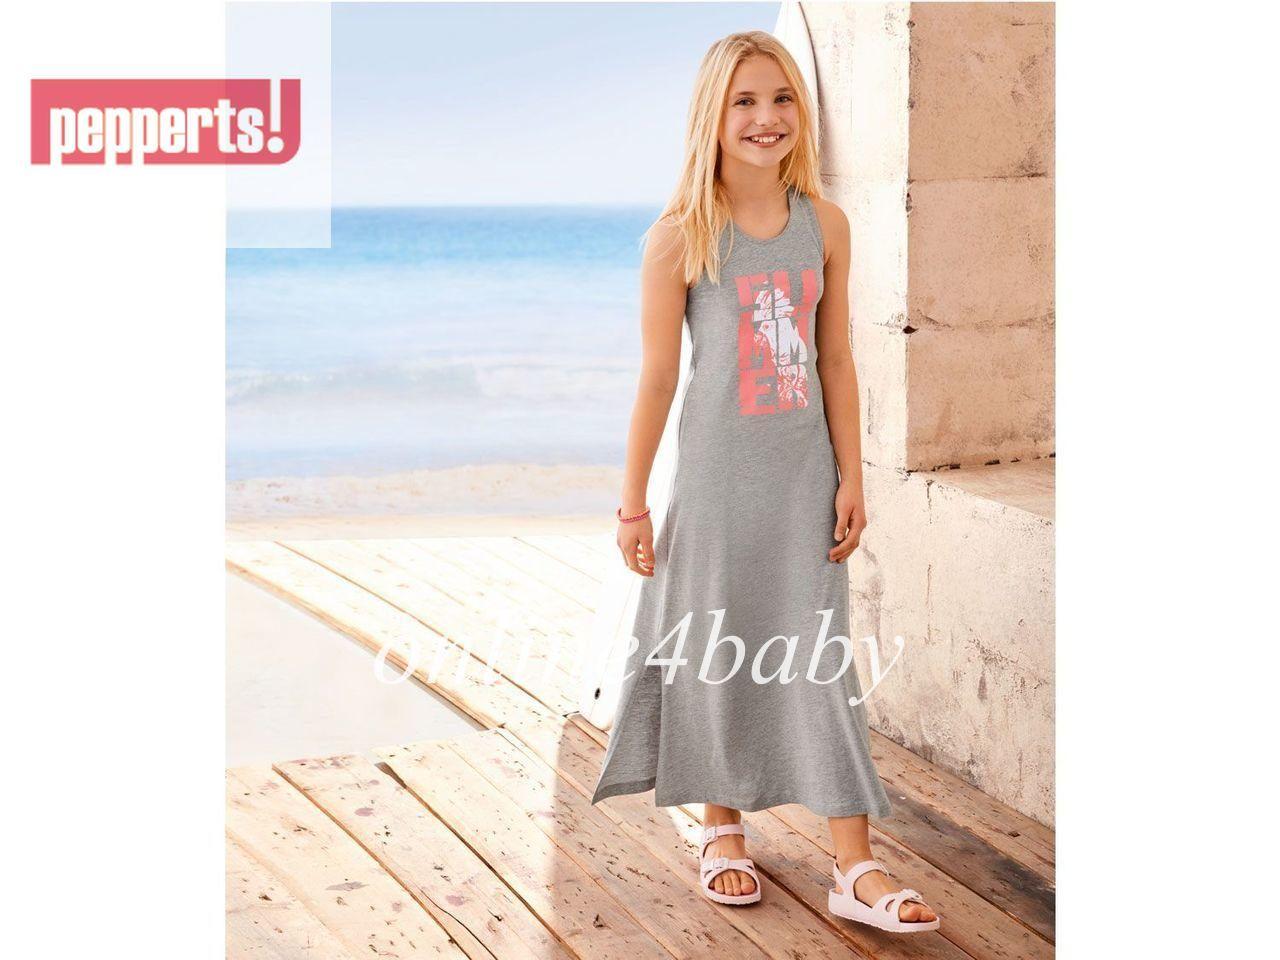 Летний сарафан платье Pepperts 6-8 лет, рост 122-128